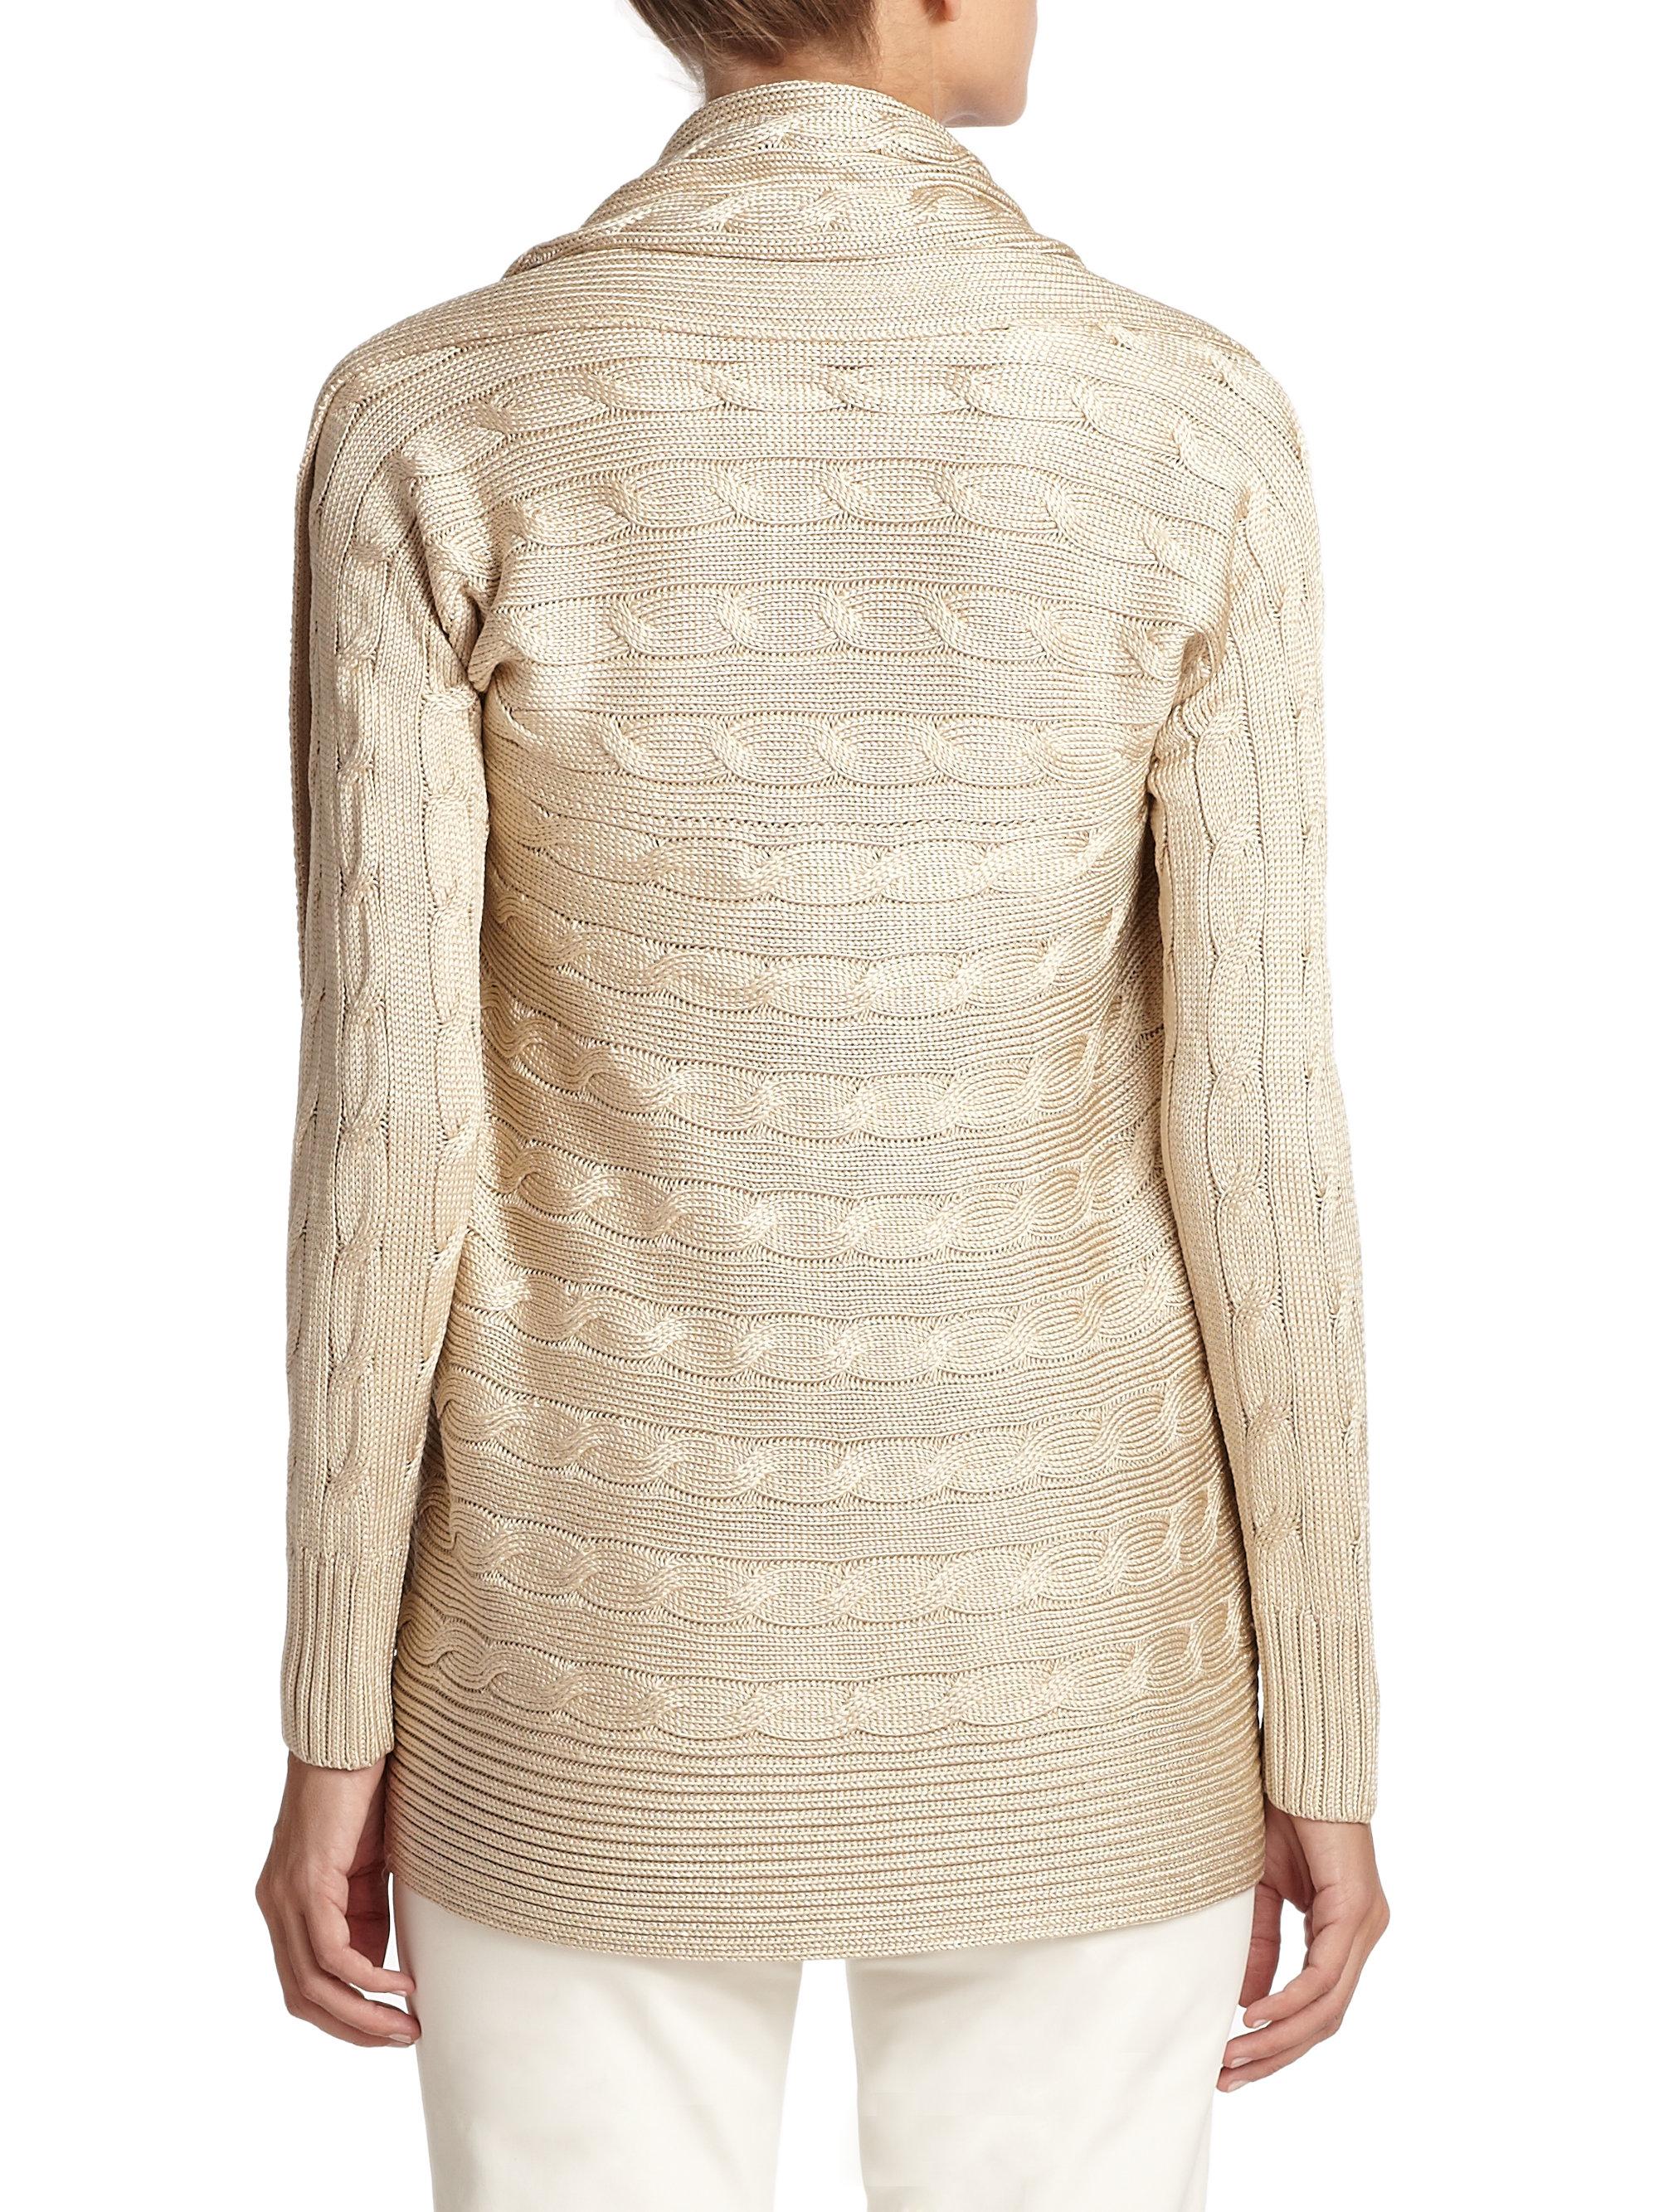 Ralph Lauren Black Label Cable Knit Dress in Natural - Lyst